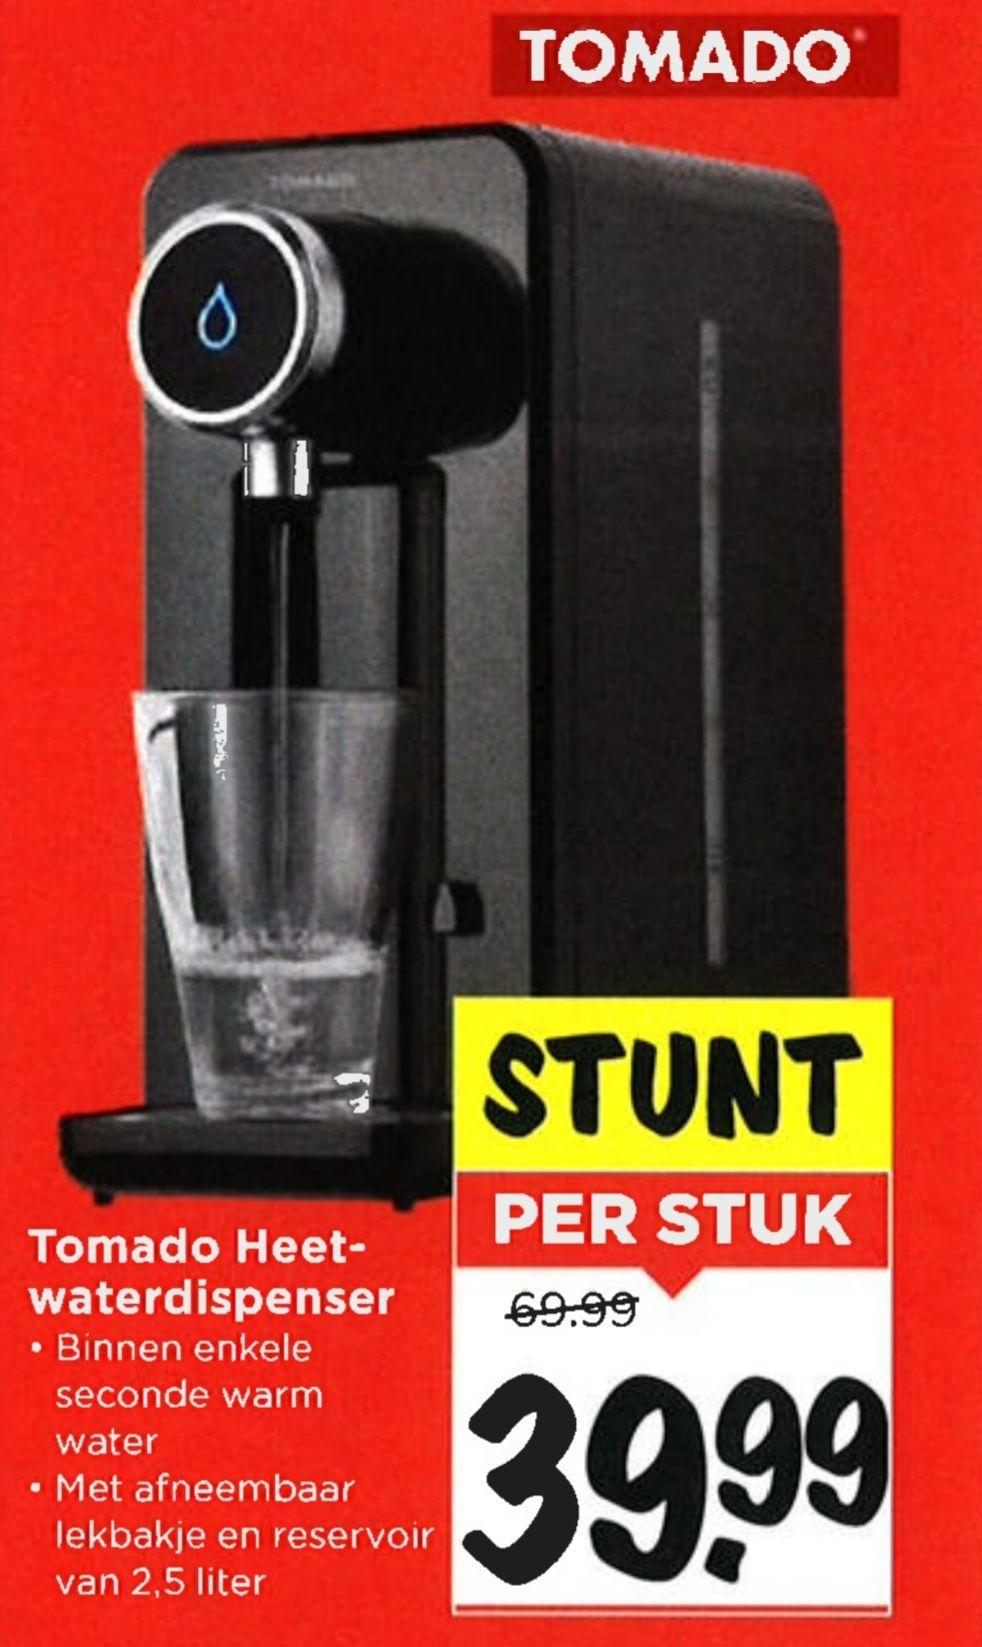 Tomado heetwaterdispenser